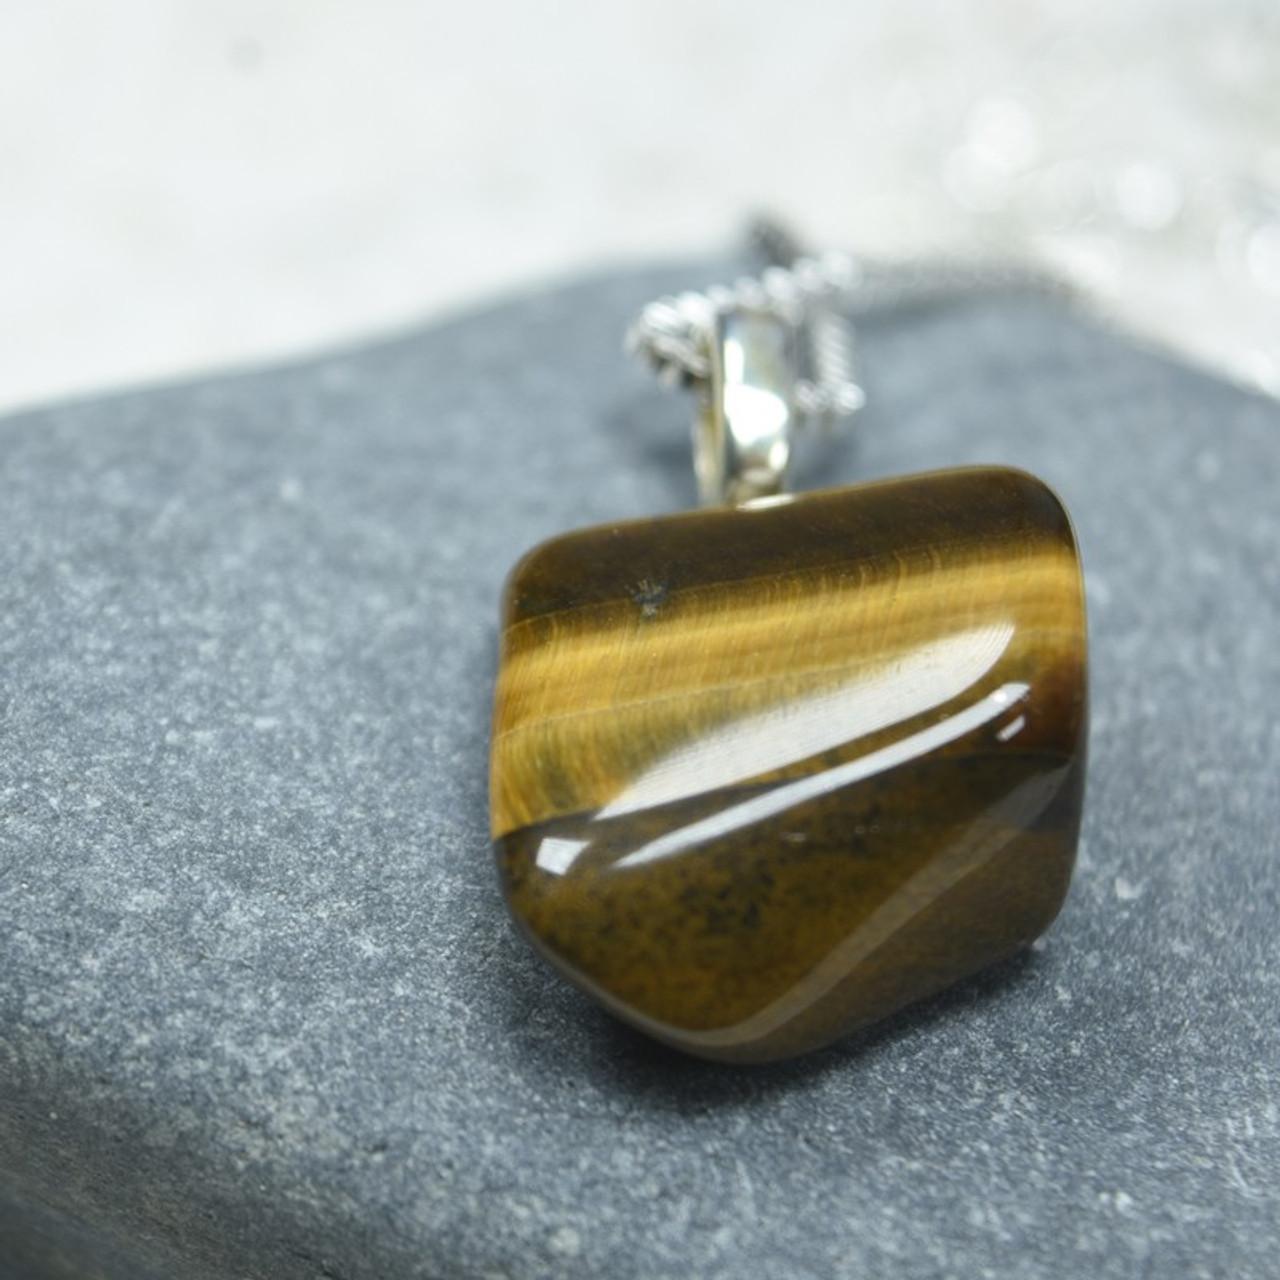 Tumbled Gold Tiger's Eye Stone Pendant